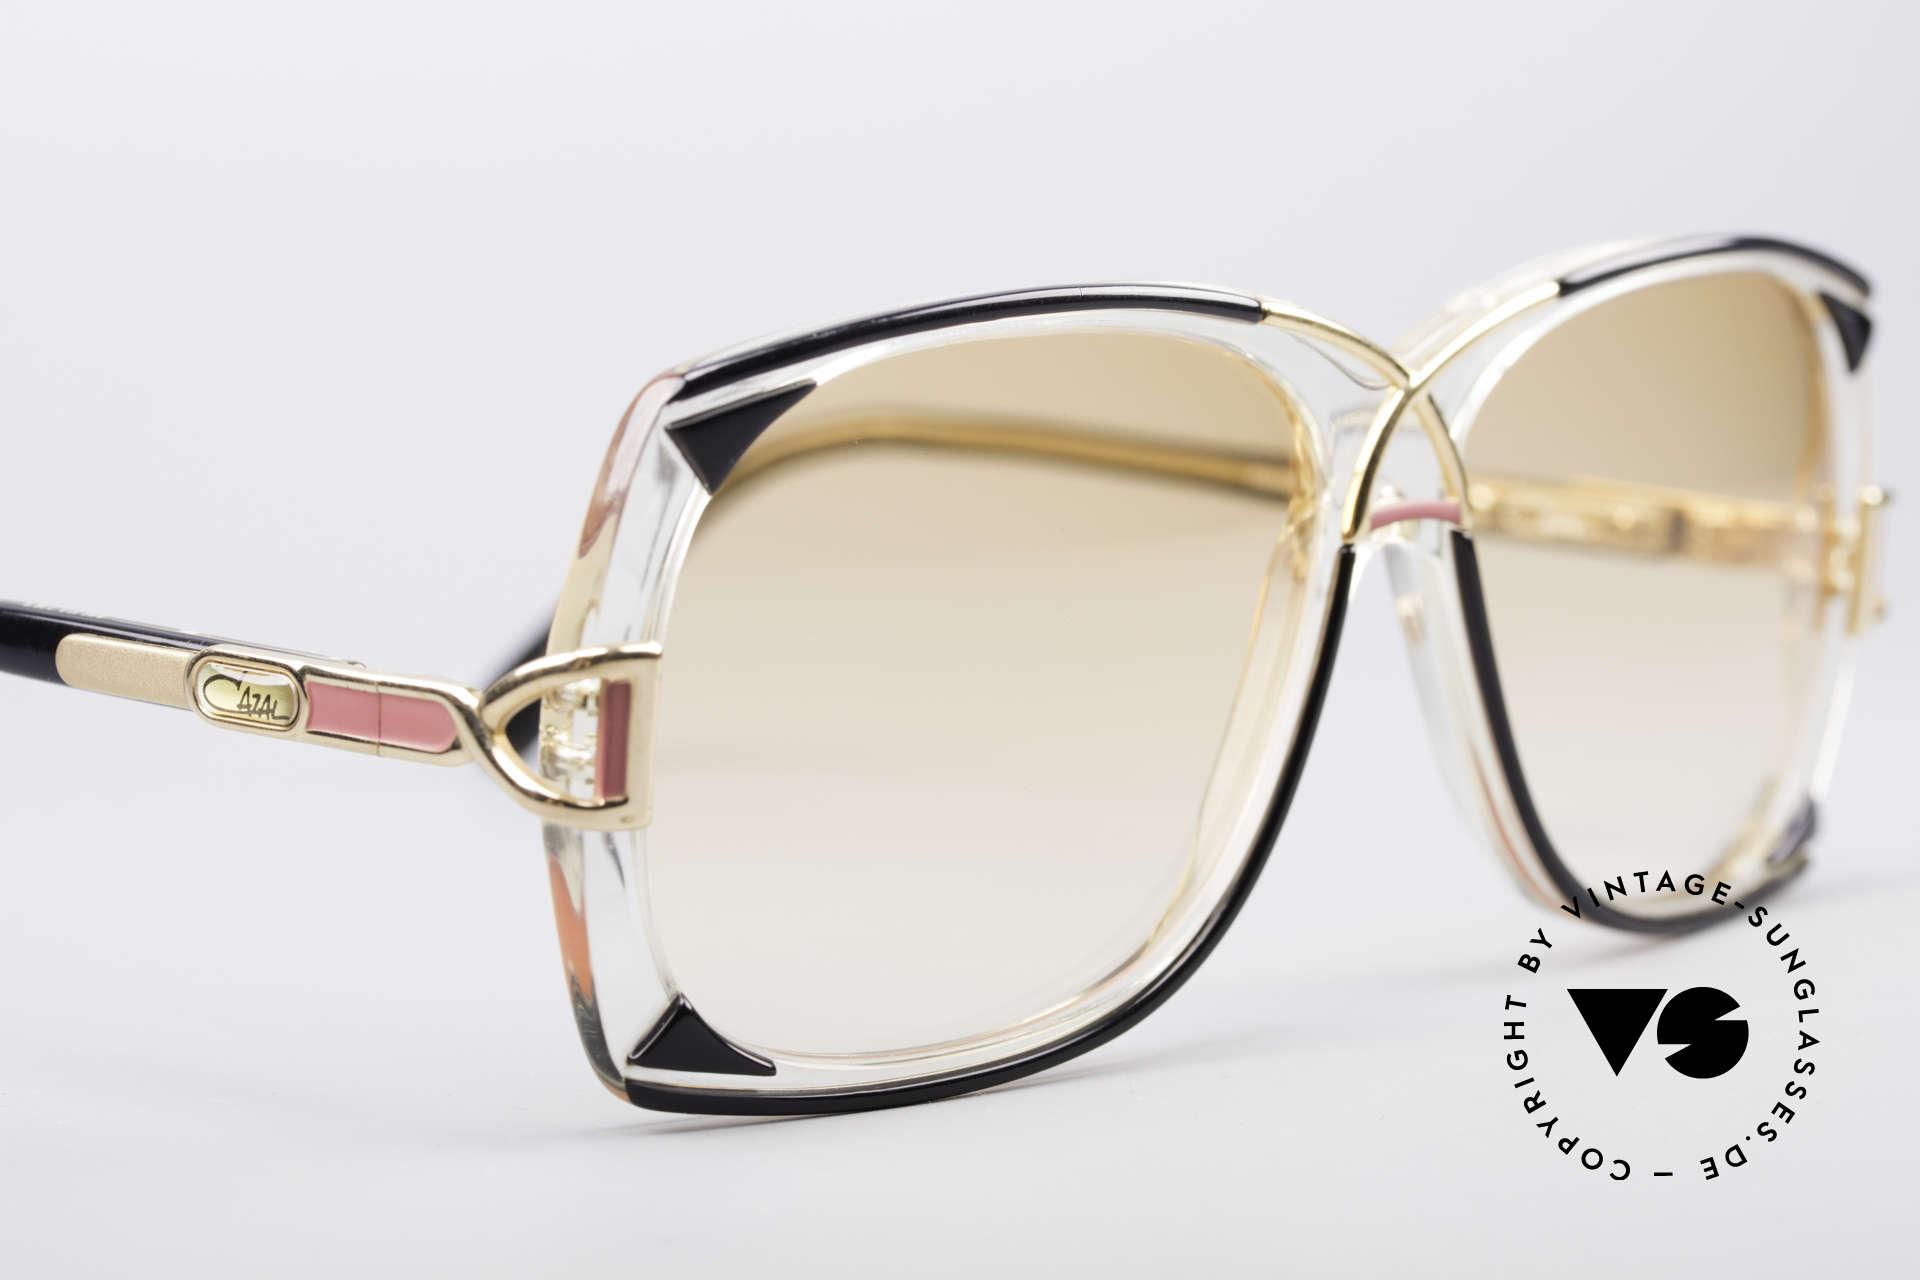 Cazal 193 Original 80's Shades, new old stock (like all vintage Cazal eyewear), Made for Women